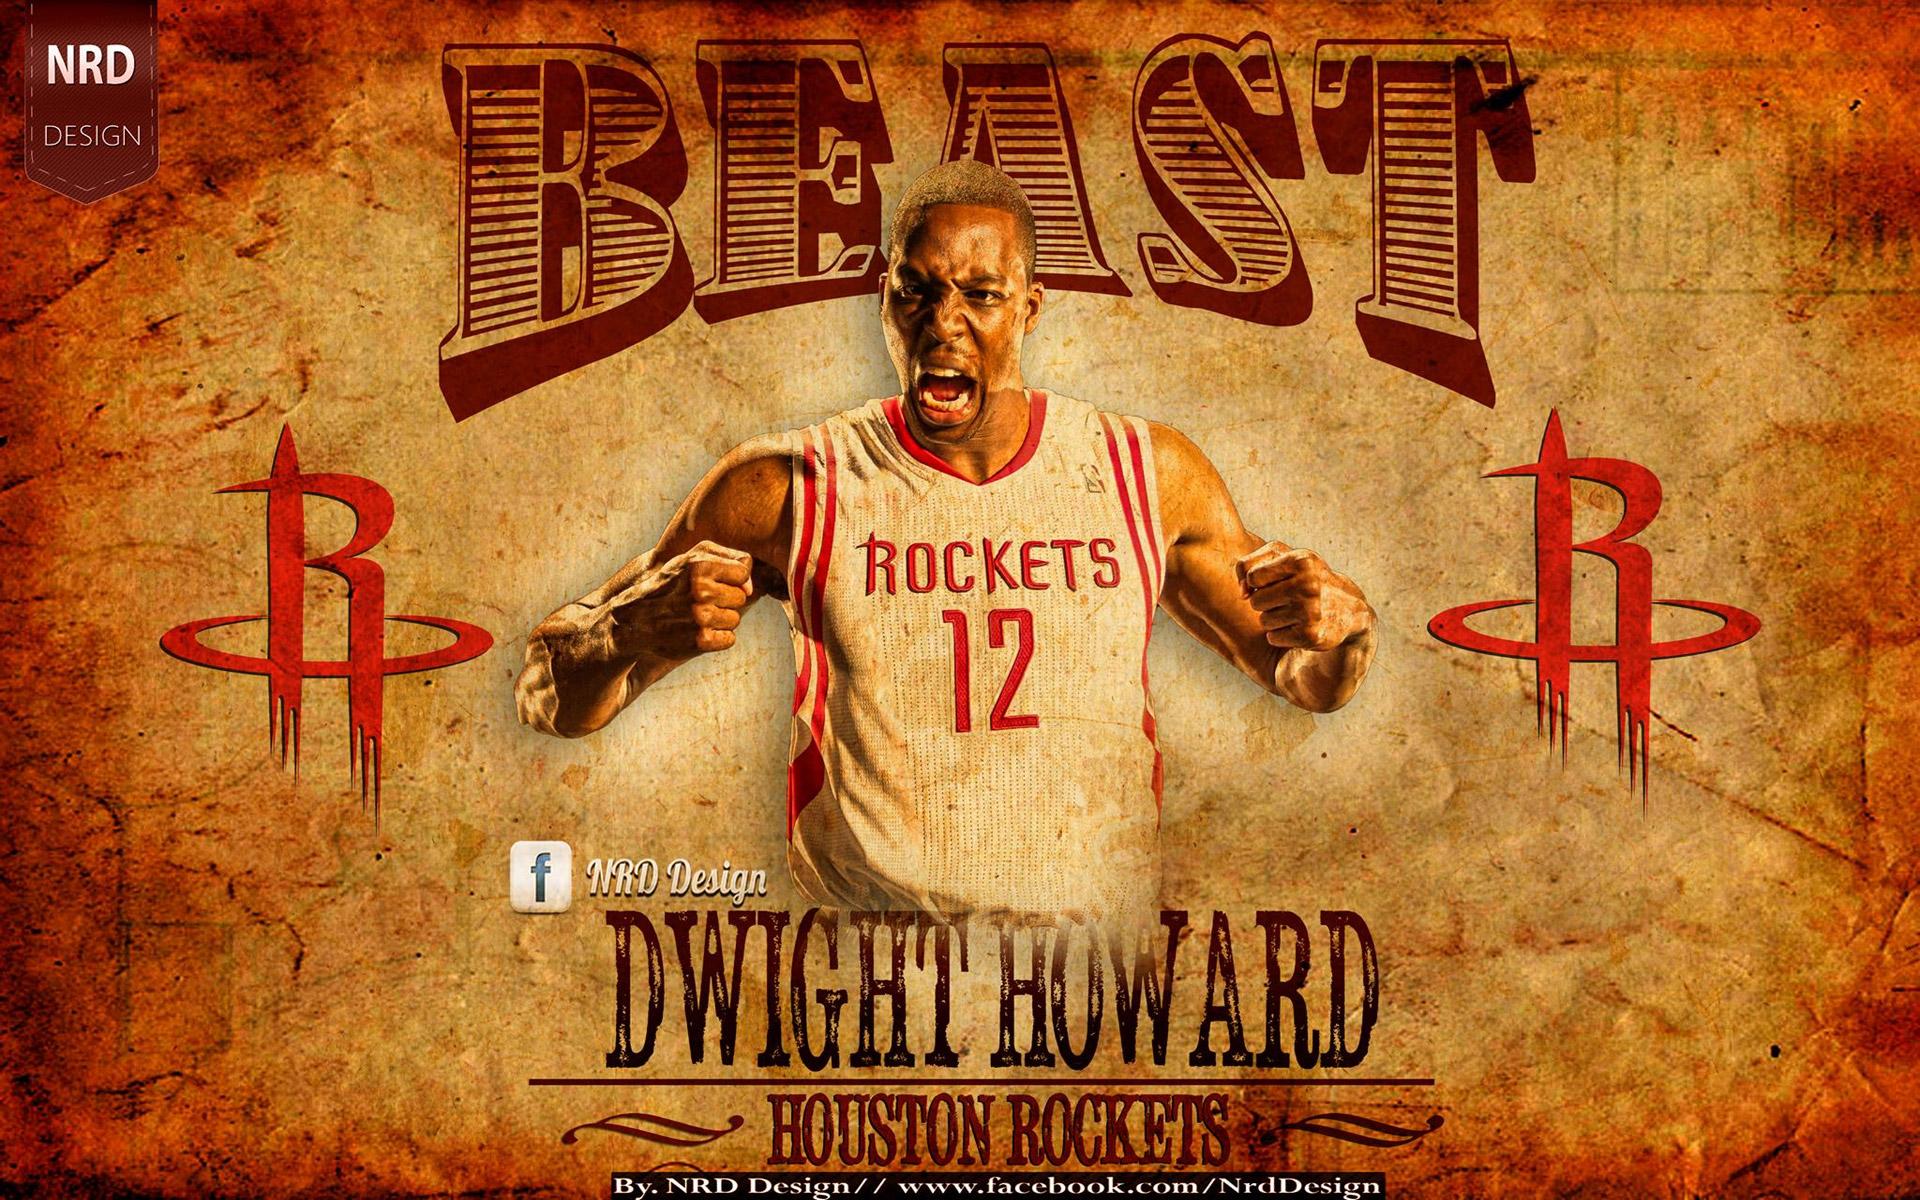 dwight howard wallpapers basketball wallpapers at